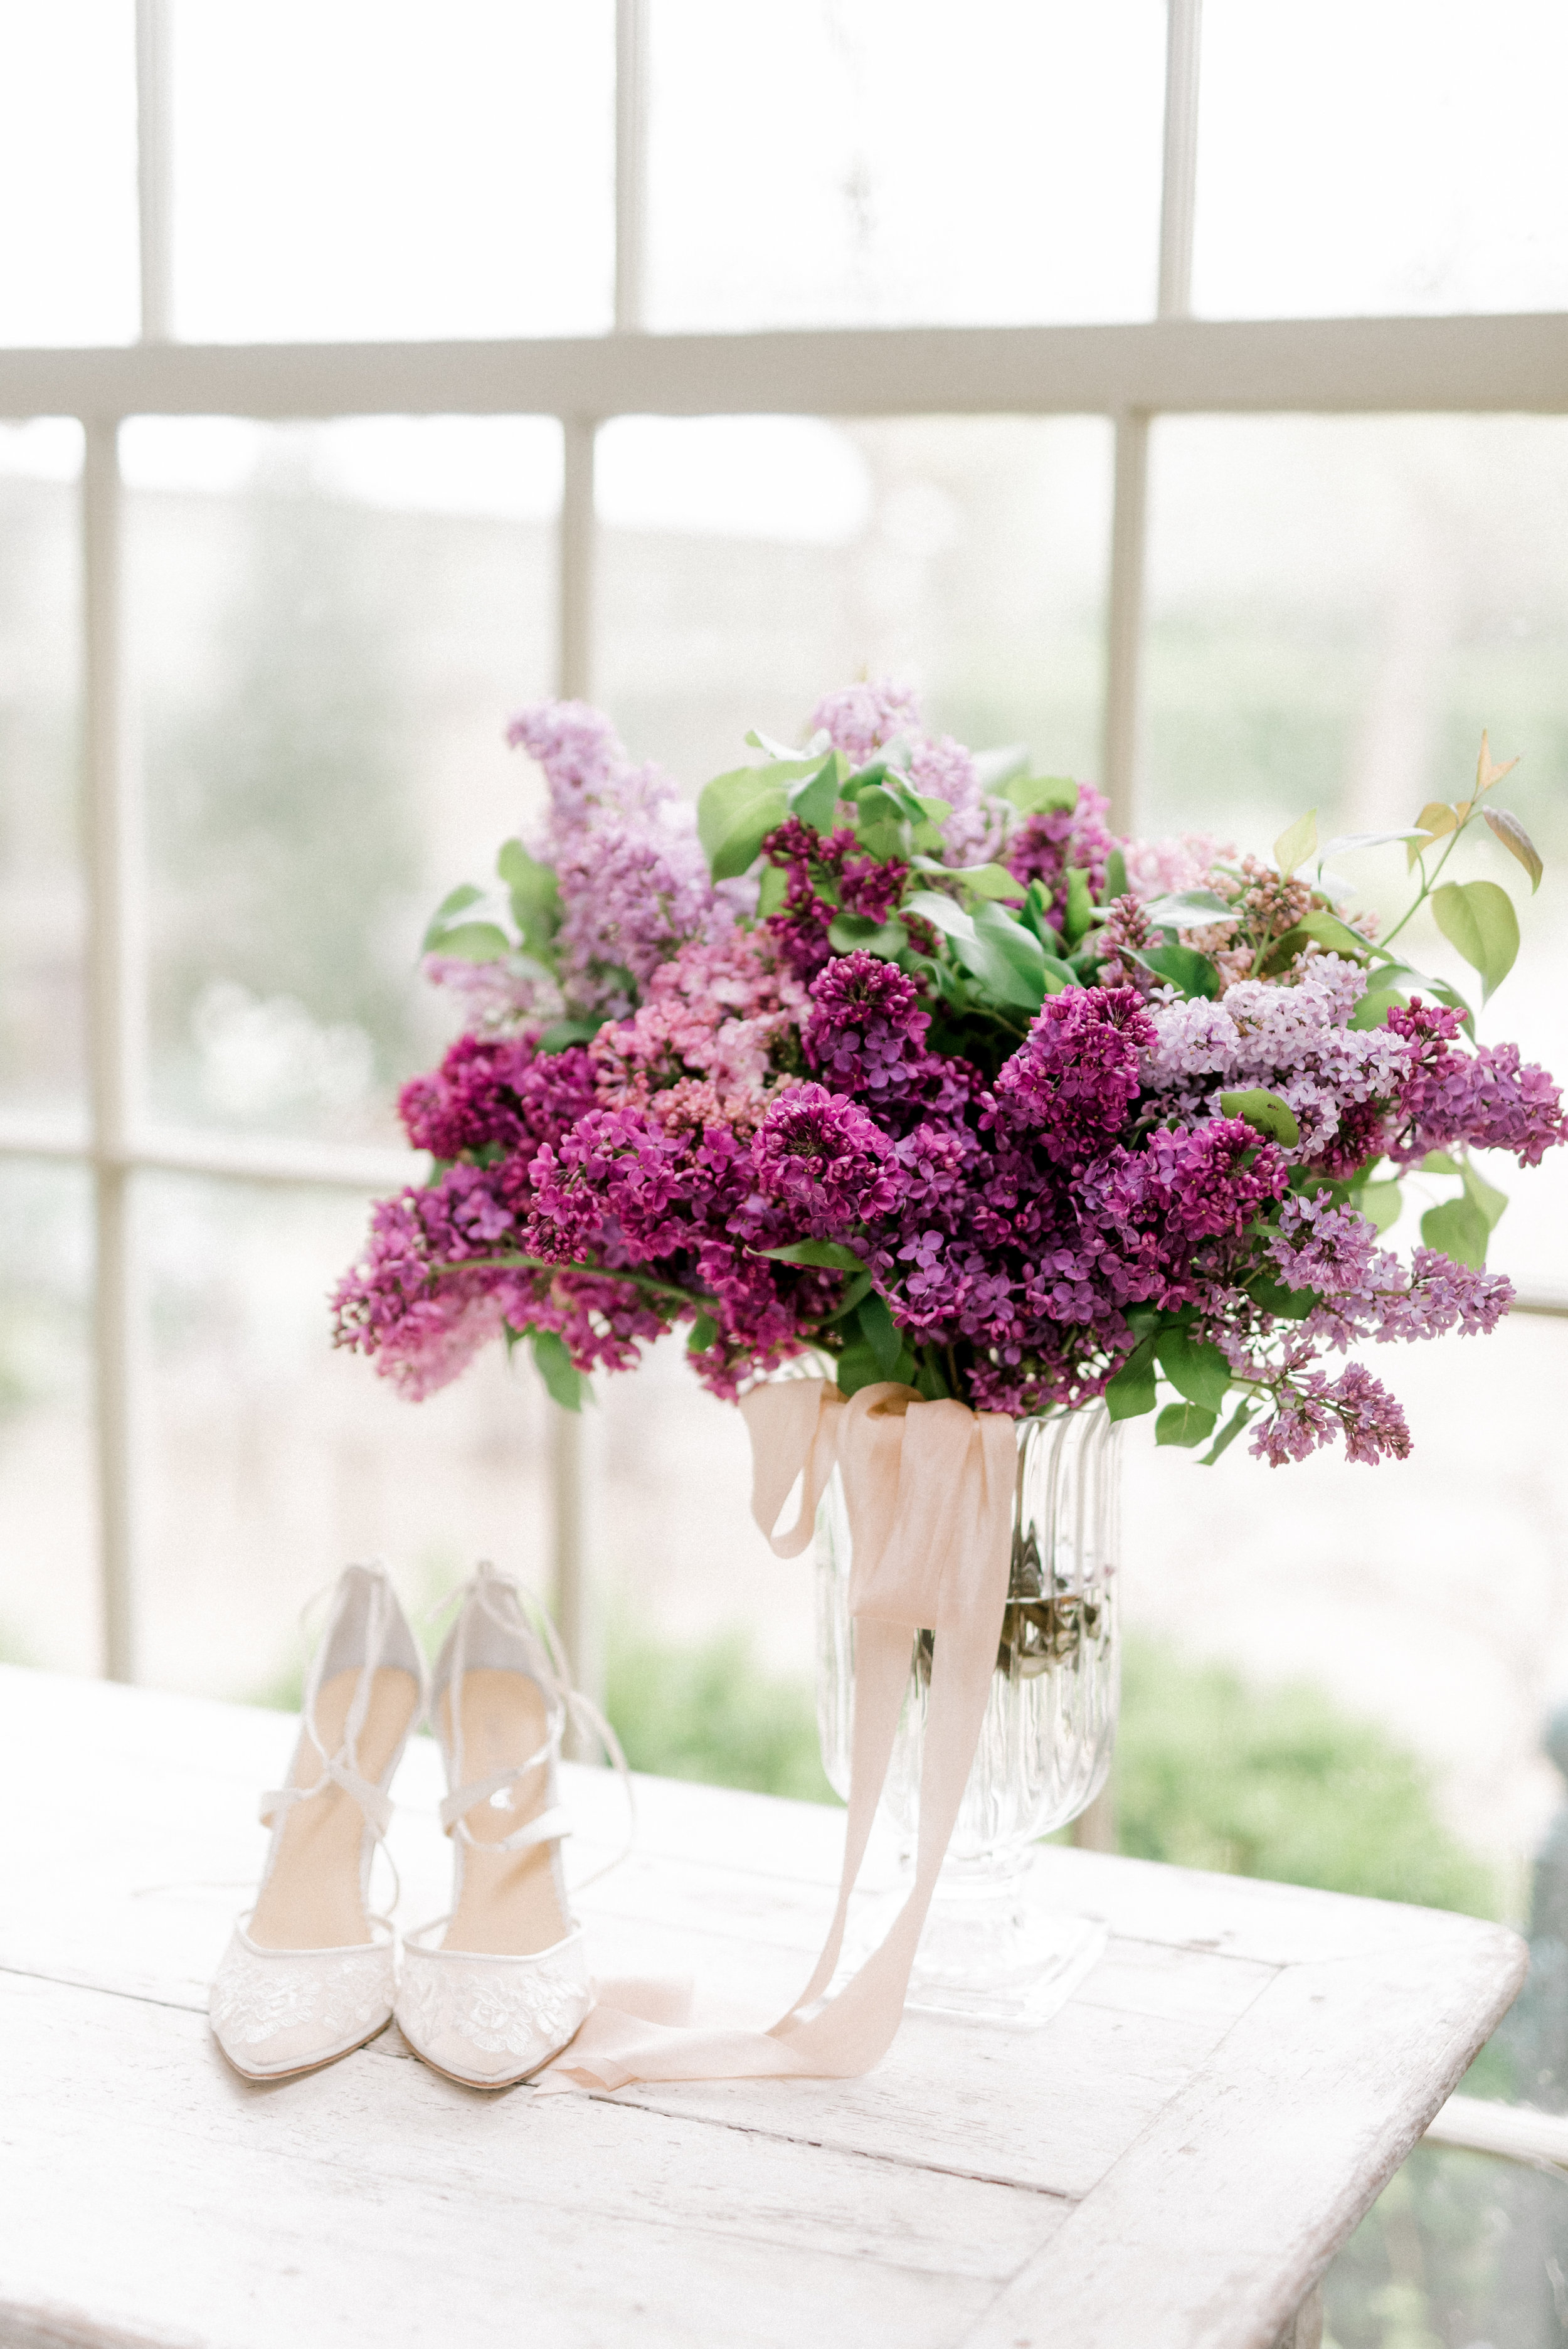 haley-richter-photography-jardin-de-buis-wedding-photos-greenhouse-wedding-bhldn-gown-lilac-wedding-bouquet-beaded-wedding-gown-new-jersey-weddings-garden-wedding-lilac-wedding-bouquet-spring-bella-belle-wedding-shoes-lace